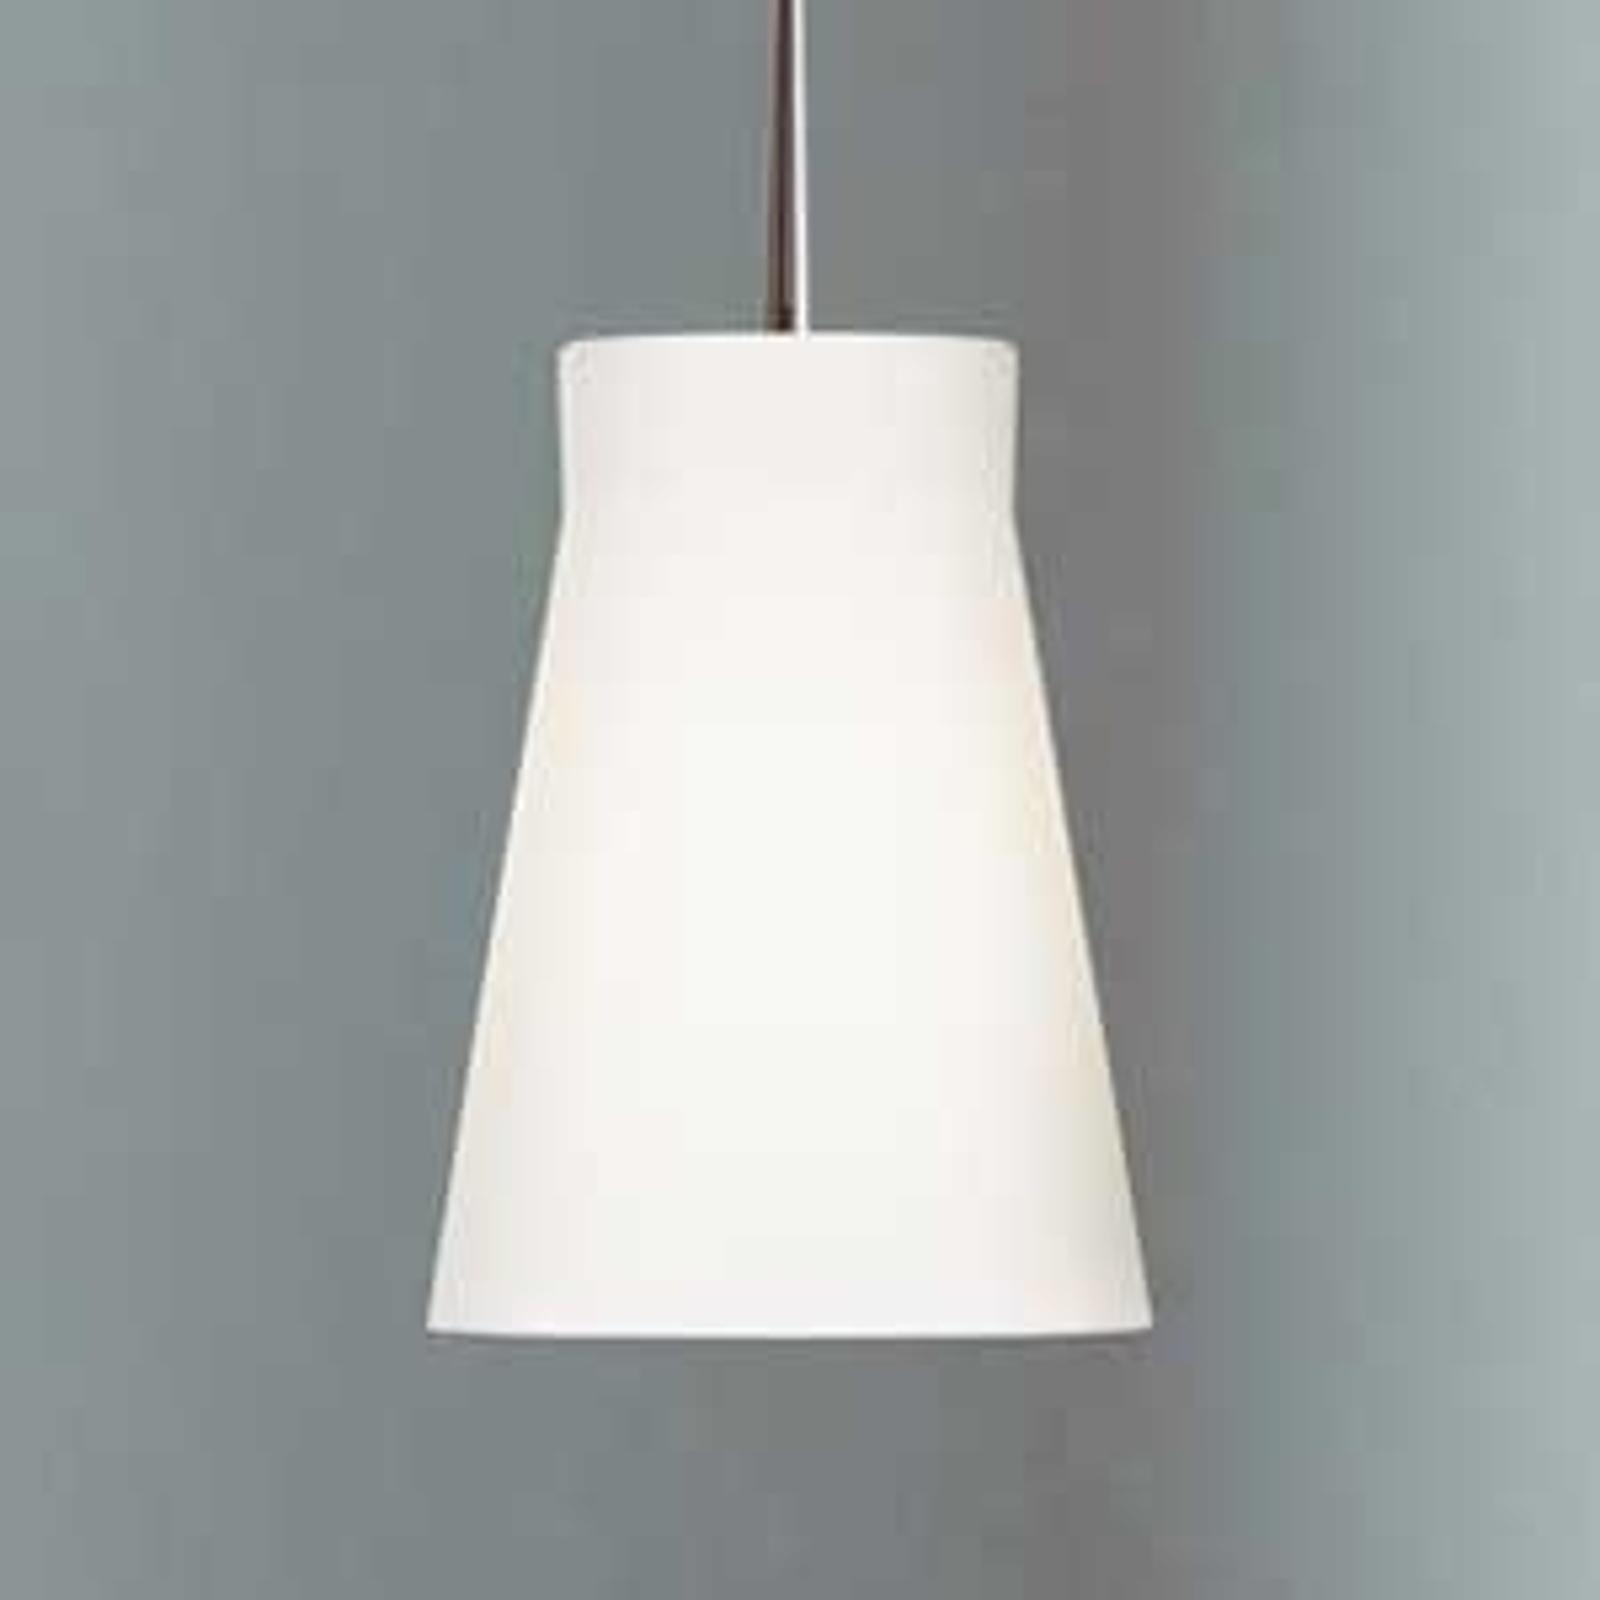 Hanglamp MOMO, 1-lichts